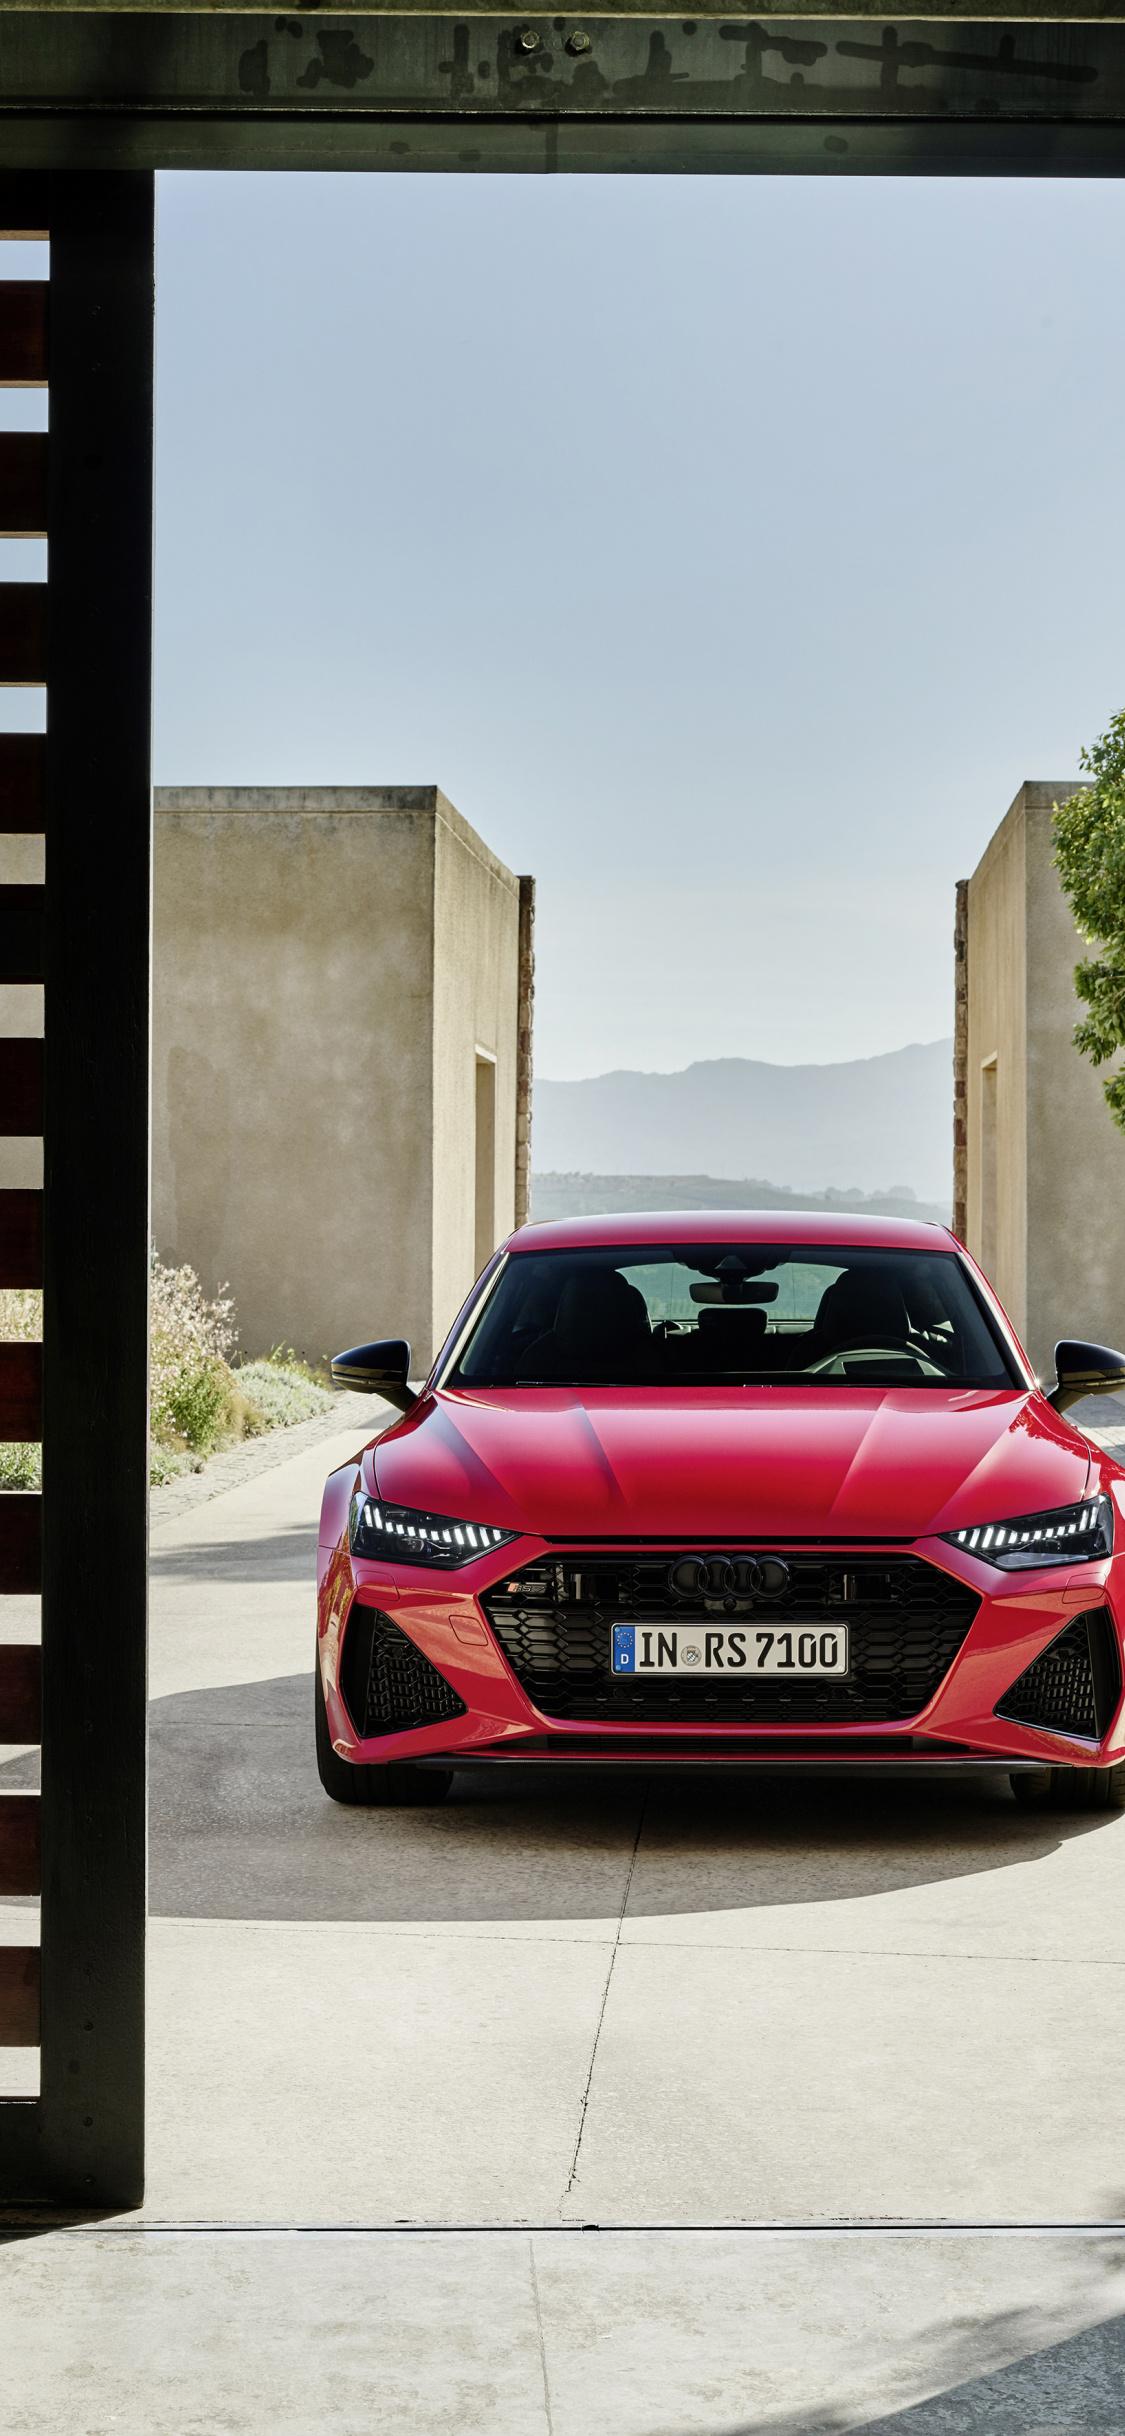 Audi Rs7 Sedan Front View 2019 Wallpaper 2478670 Hd Wallpaper Backgrounds Download